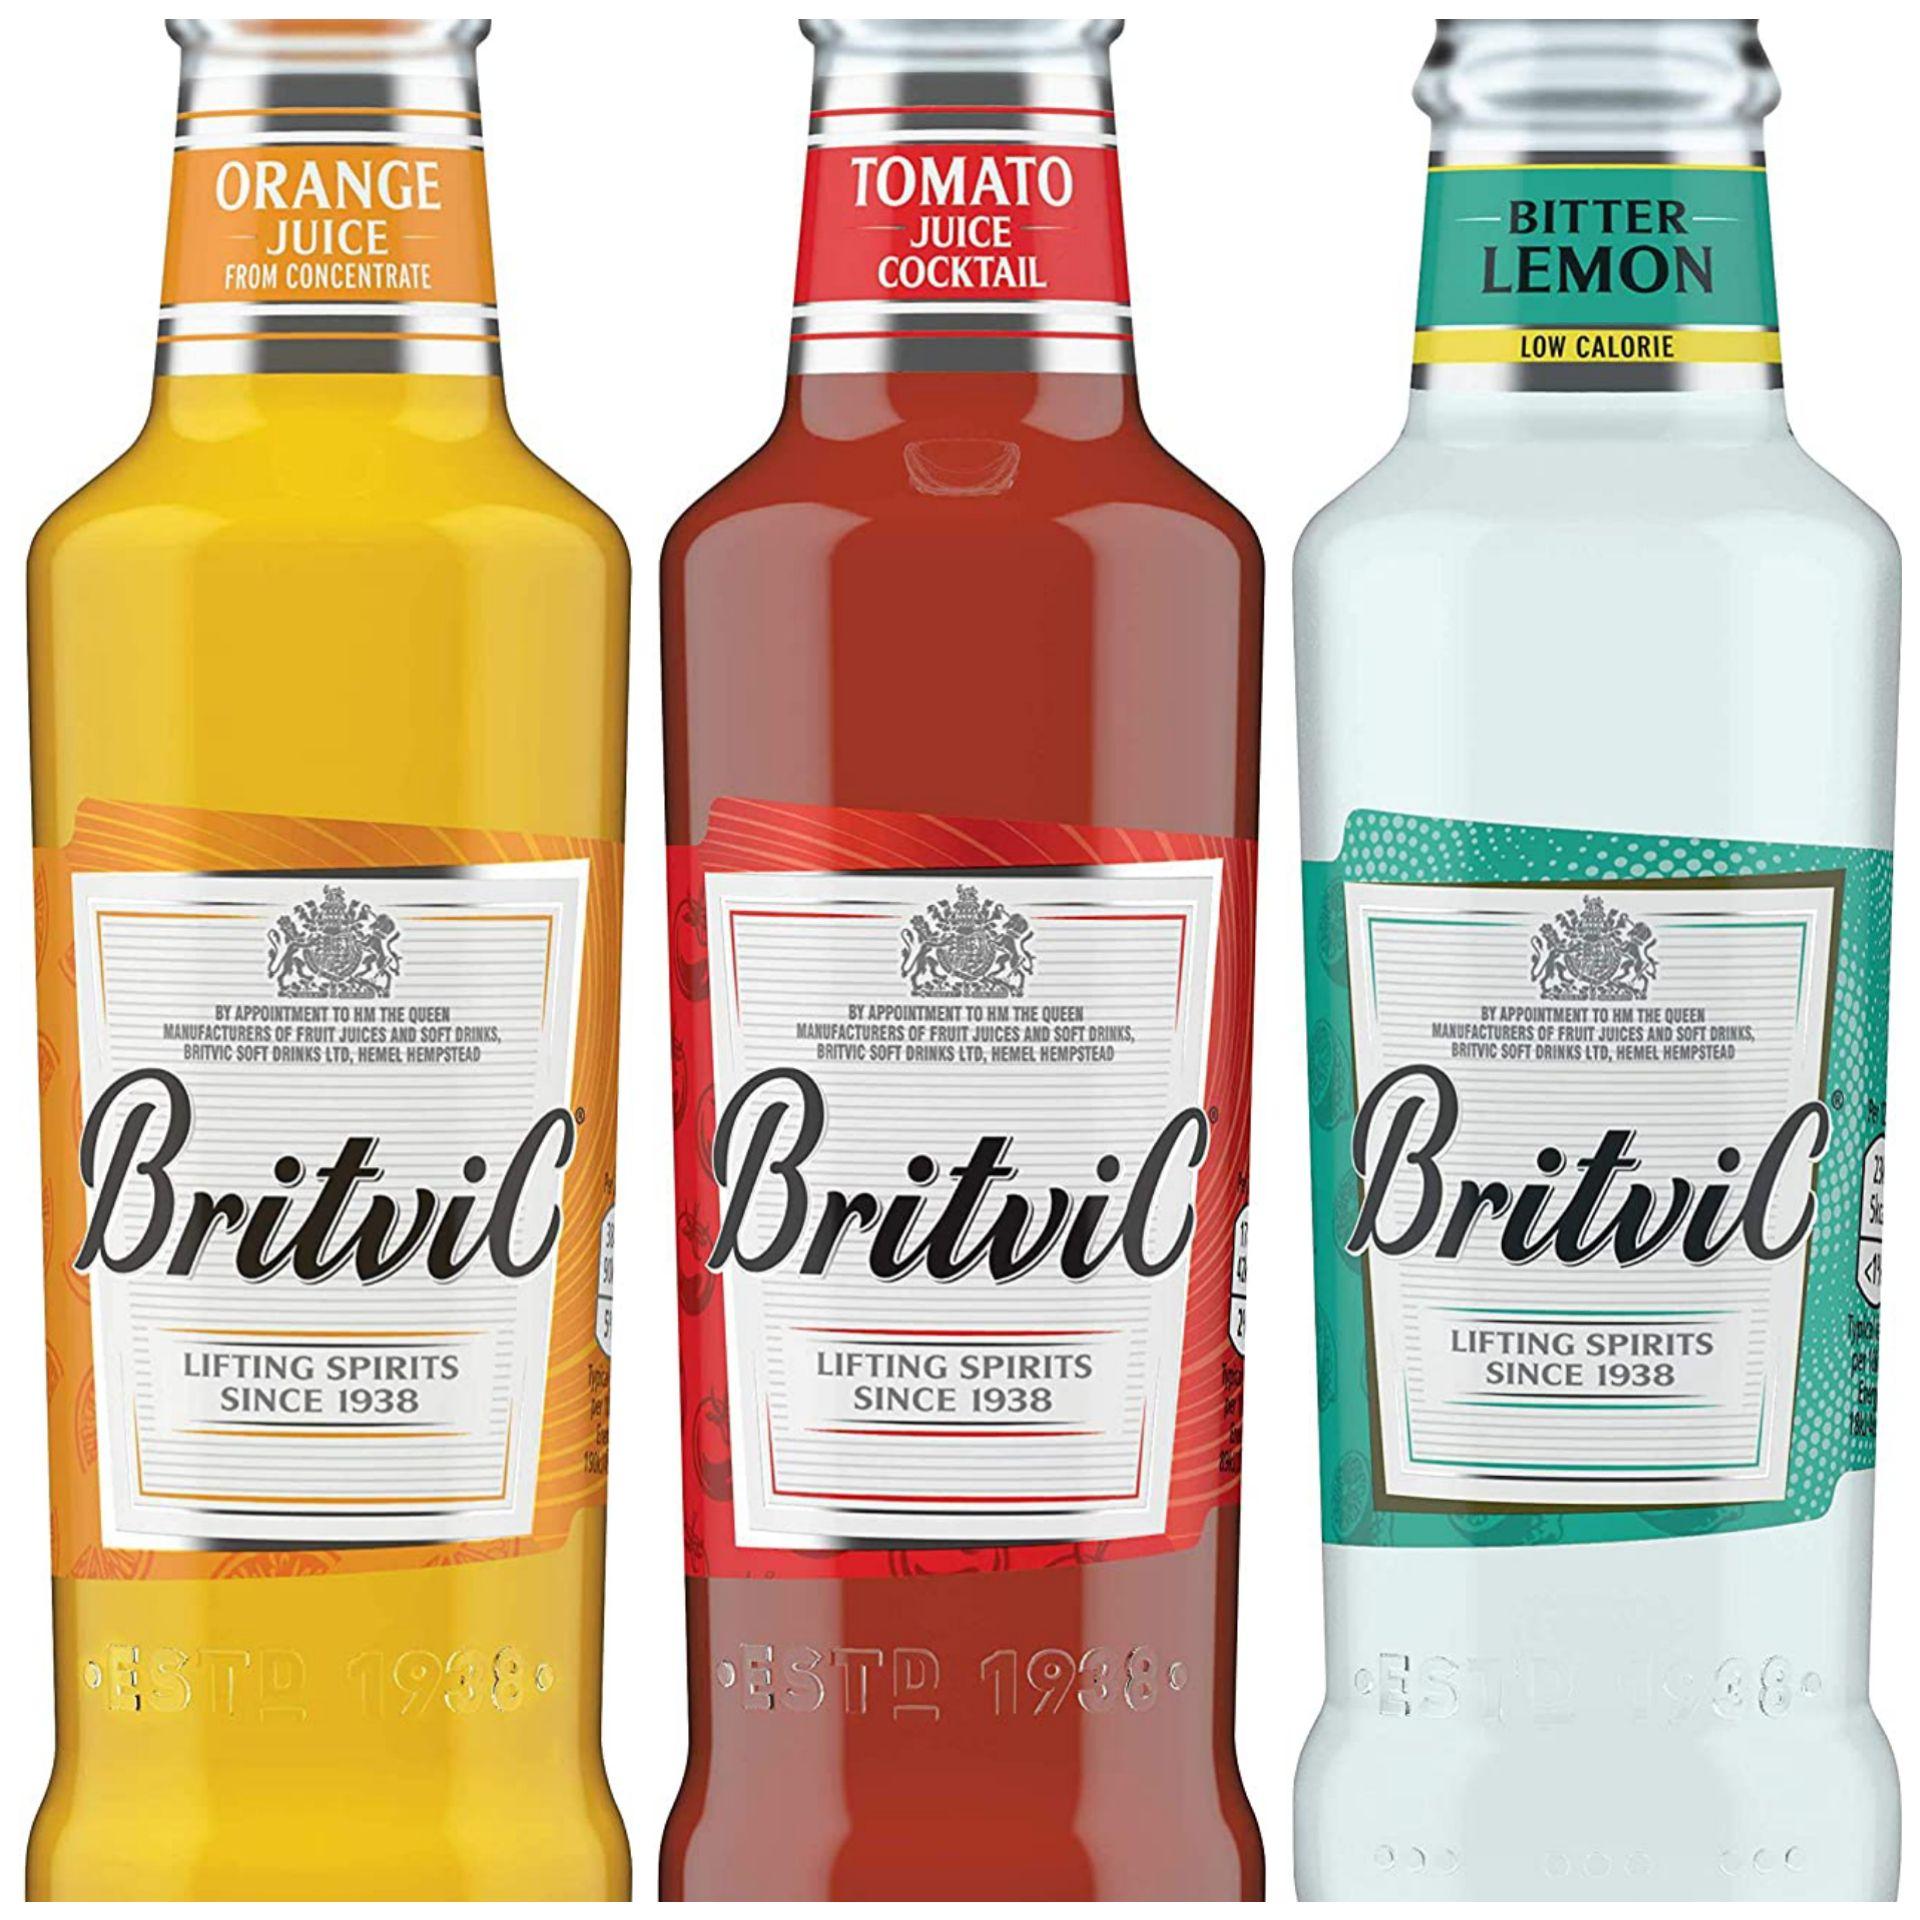 Britvic Orange Juice / tomato juice / bitter lemon 24 X 200ml £10 (£4.49 p&p np) 20% voucher and s&s £6.50/ £7 @ Amazon